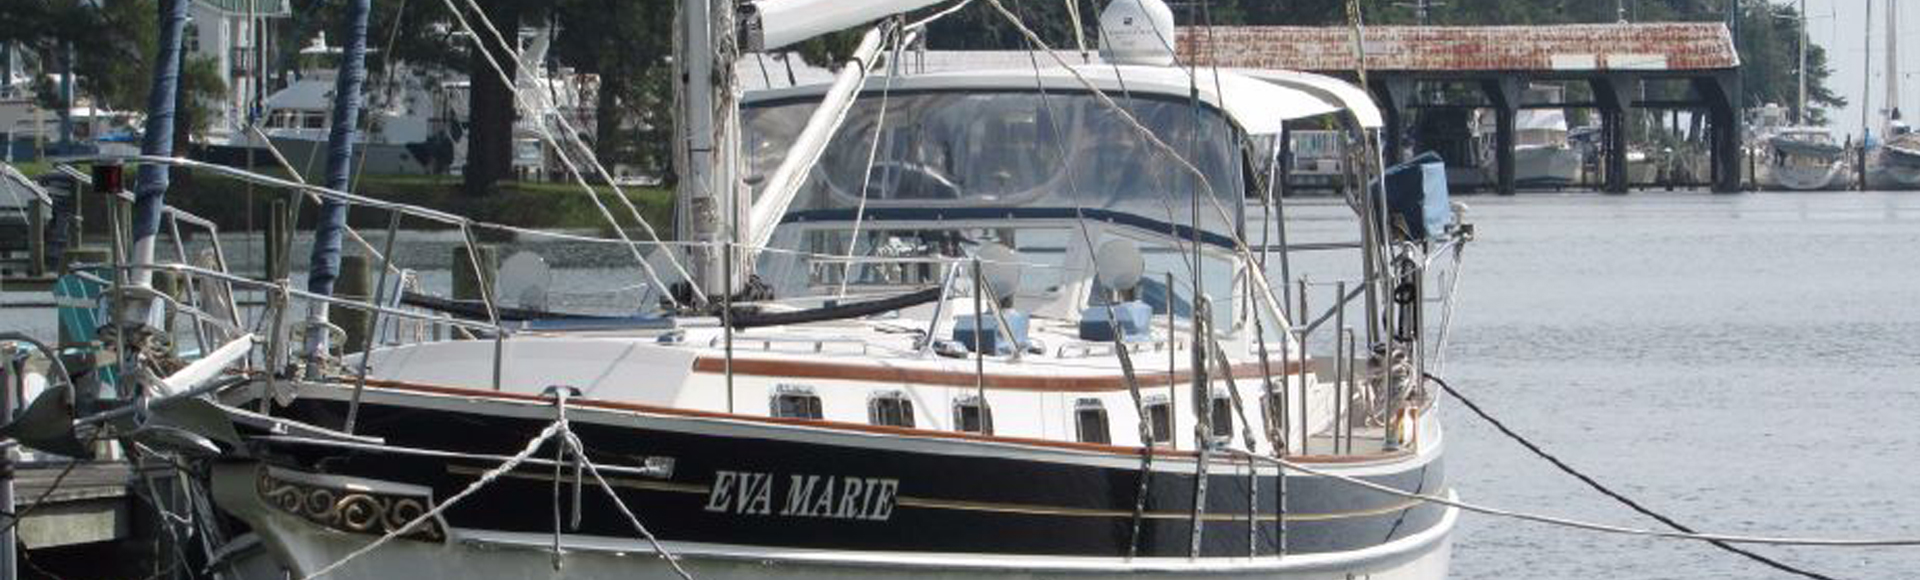 "SOLD FALL 2018 – 2007 Gozzard 44B Mk 2 Hull #23 ""Eva Marie"""